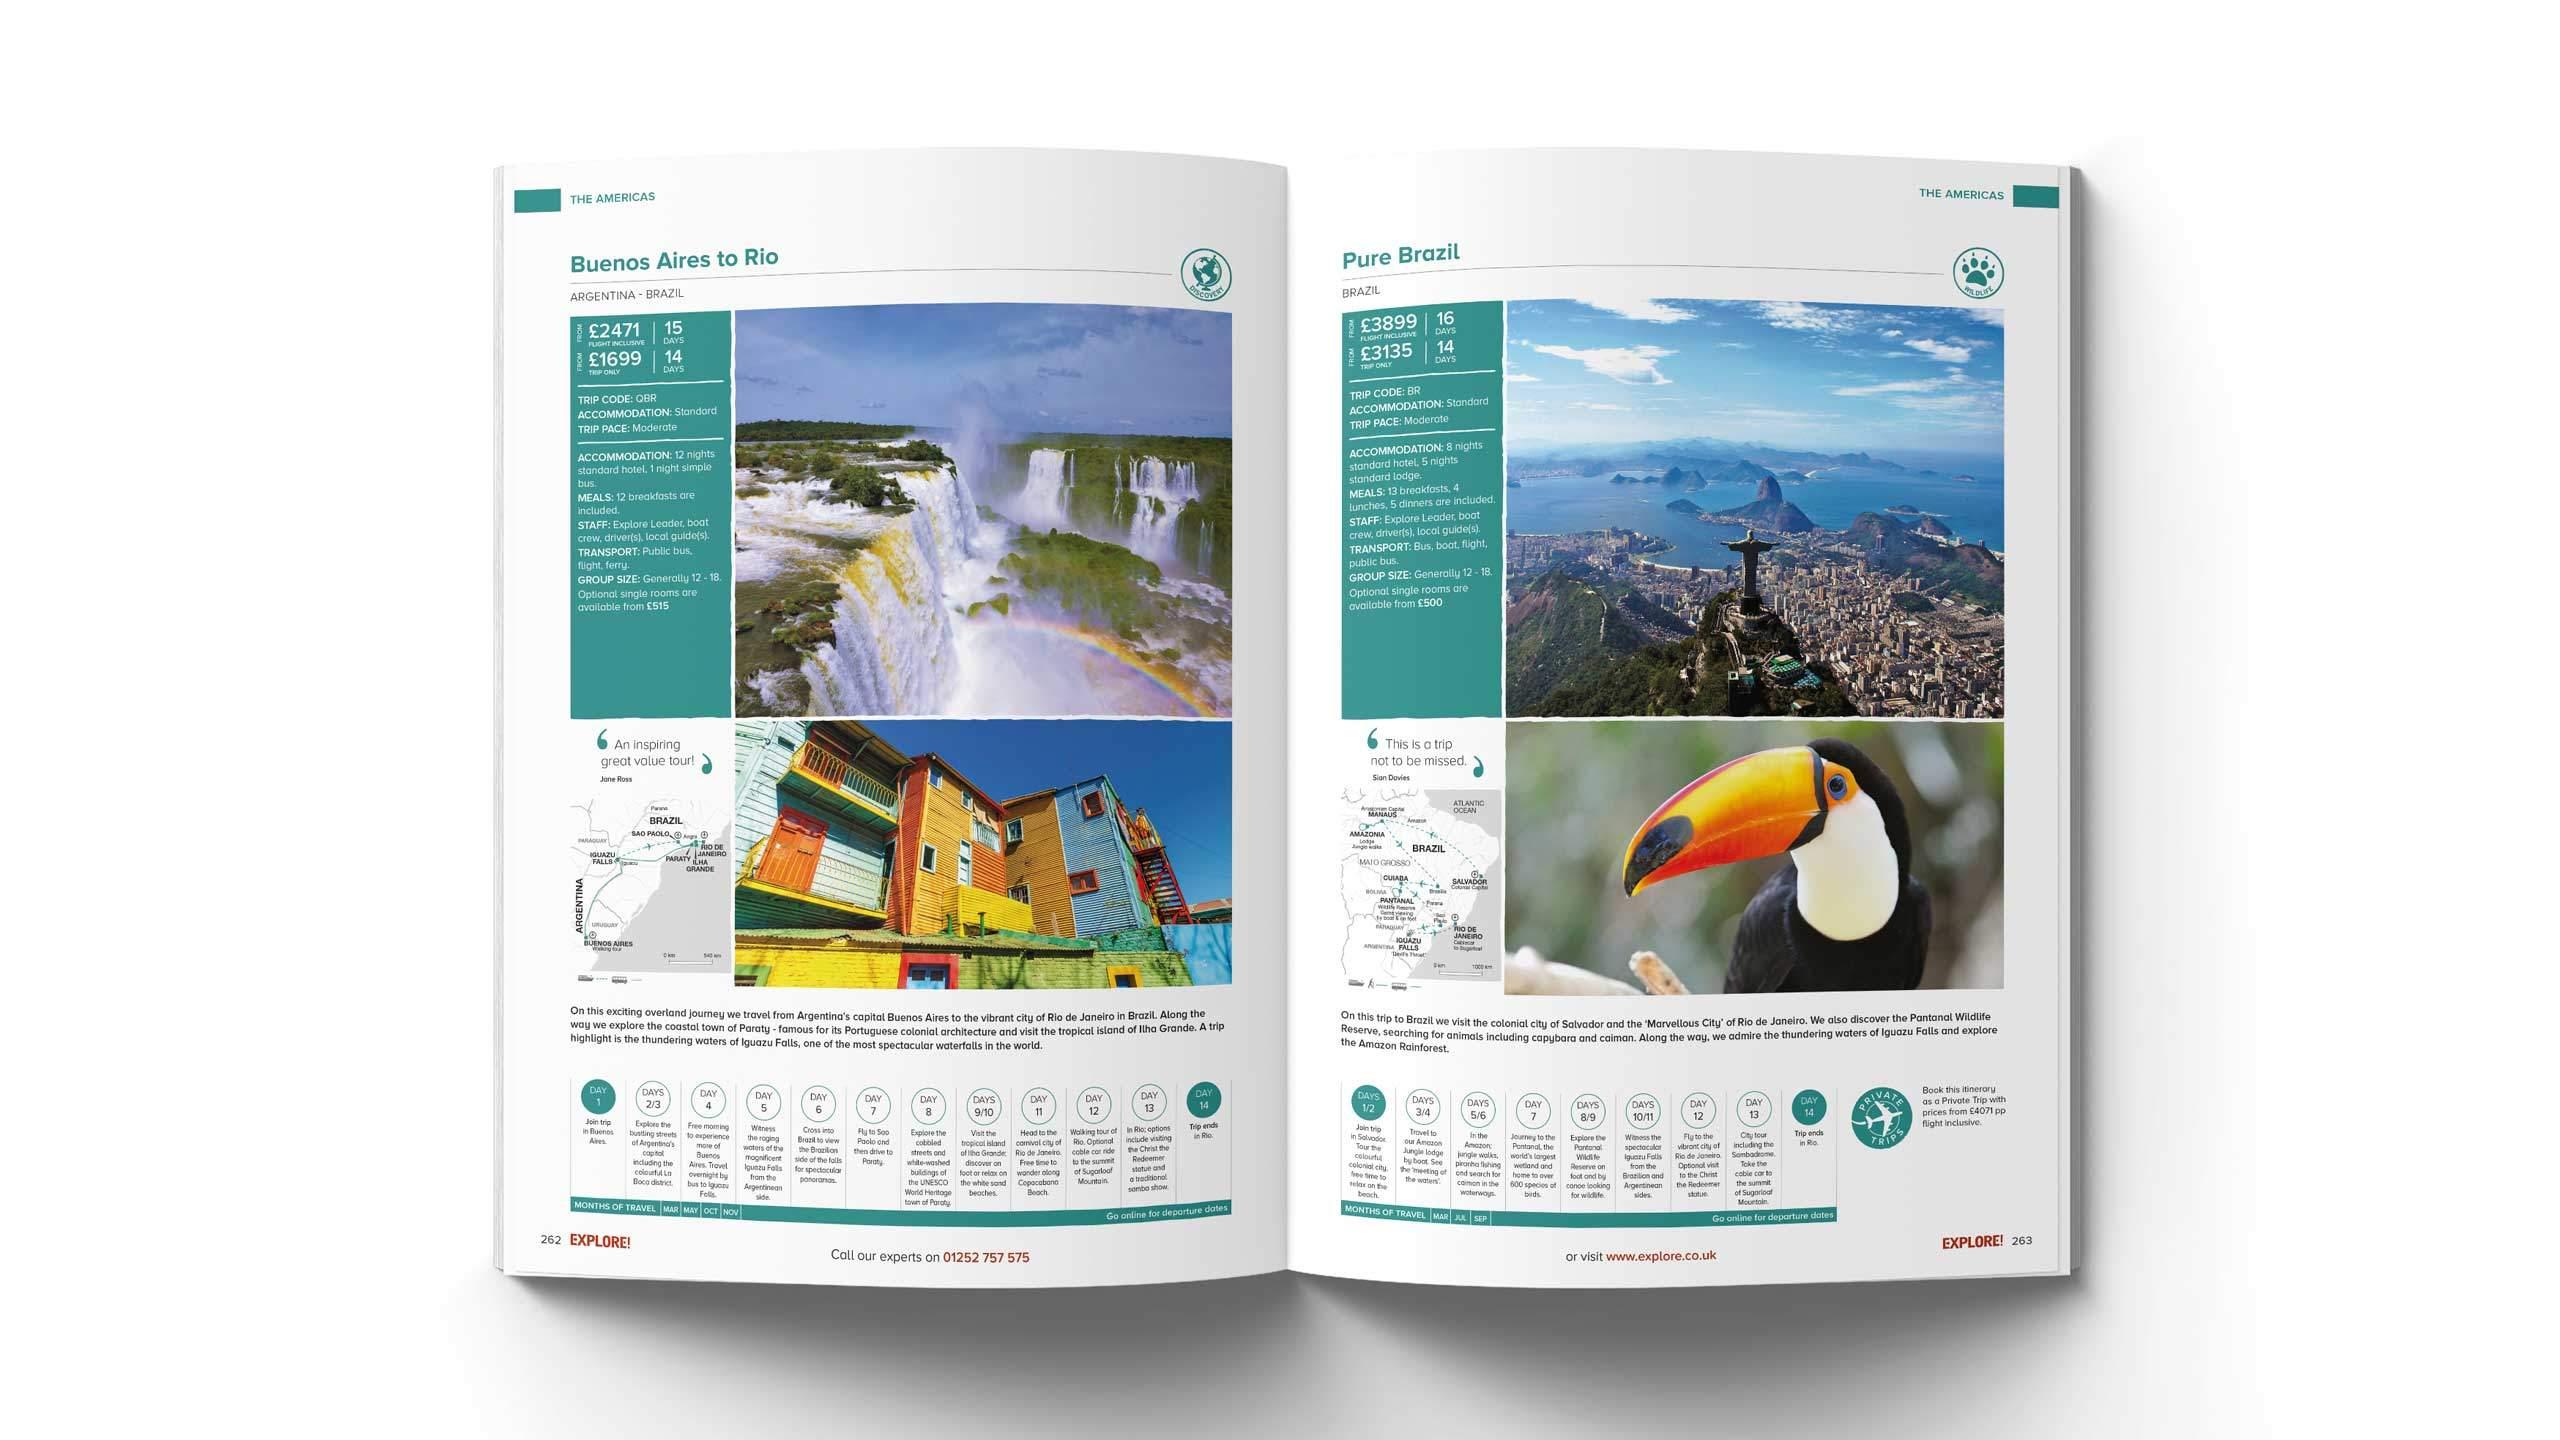 adventure travel brochure design refresh buenos aires rio brazil pages explore worldwide